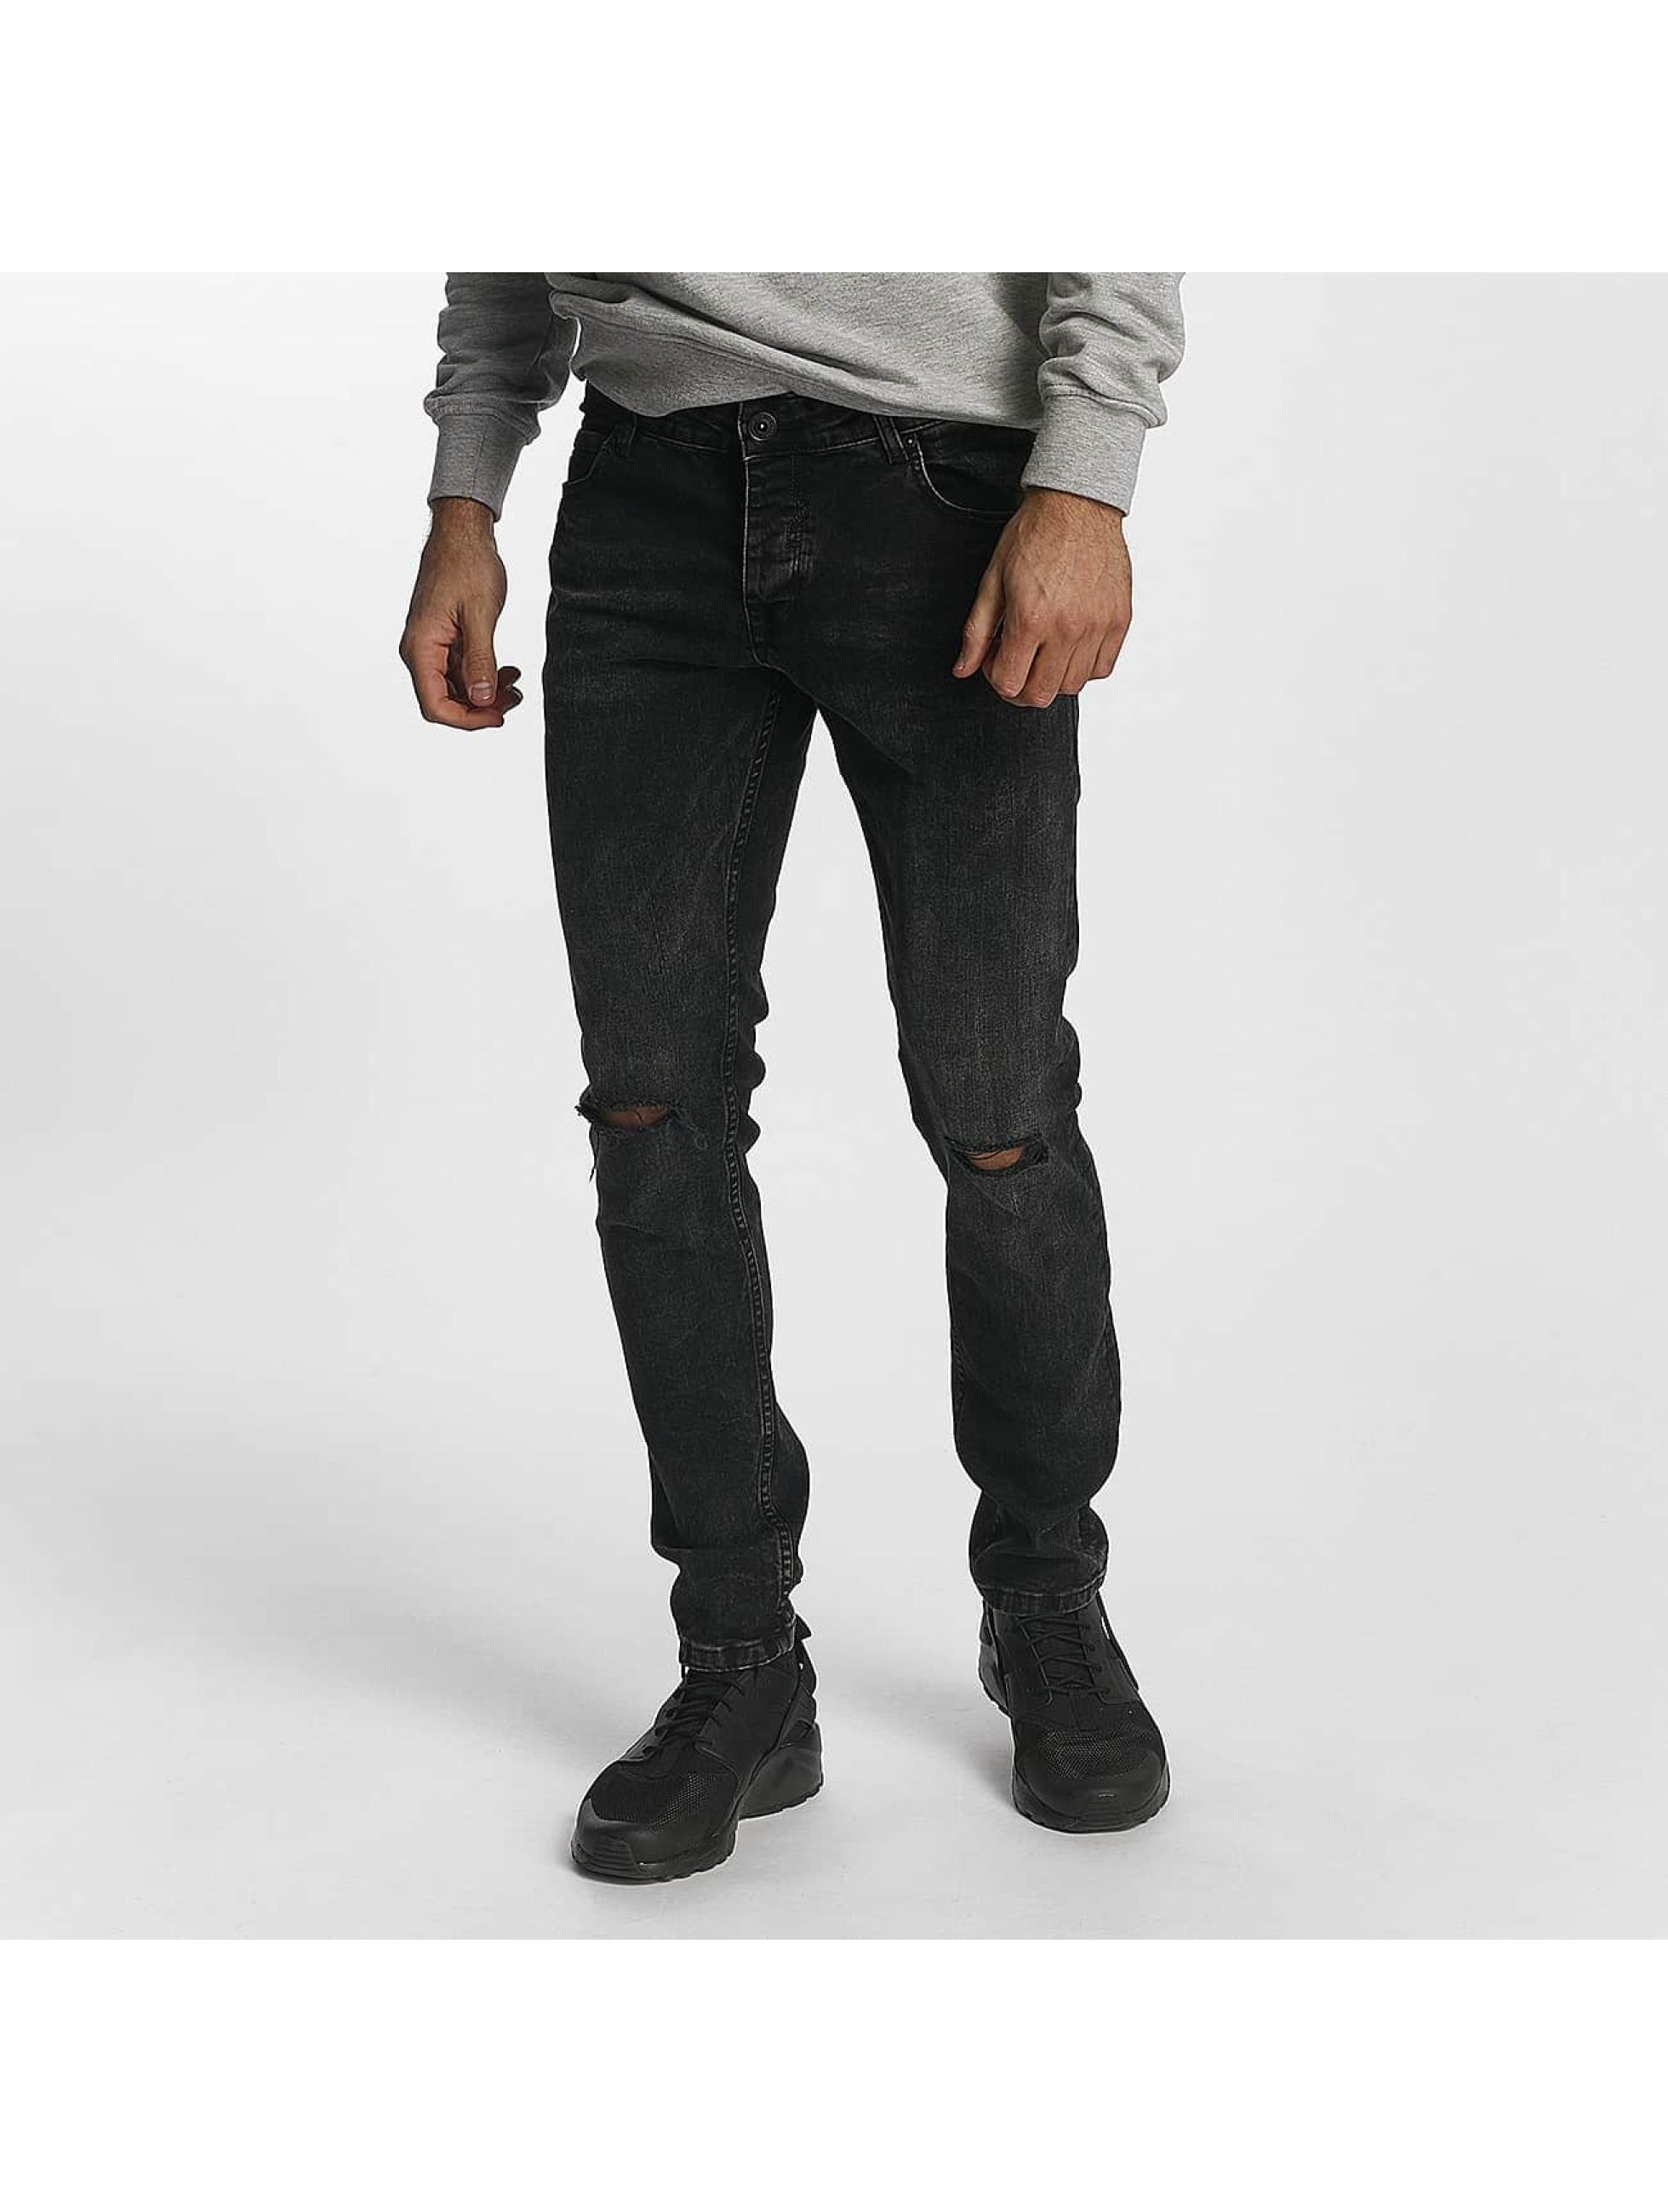 2Y / Skinny Jeans Harry in black W 34